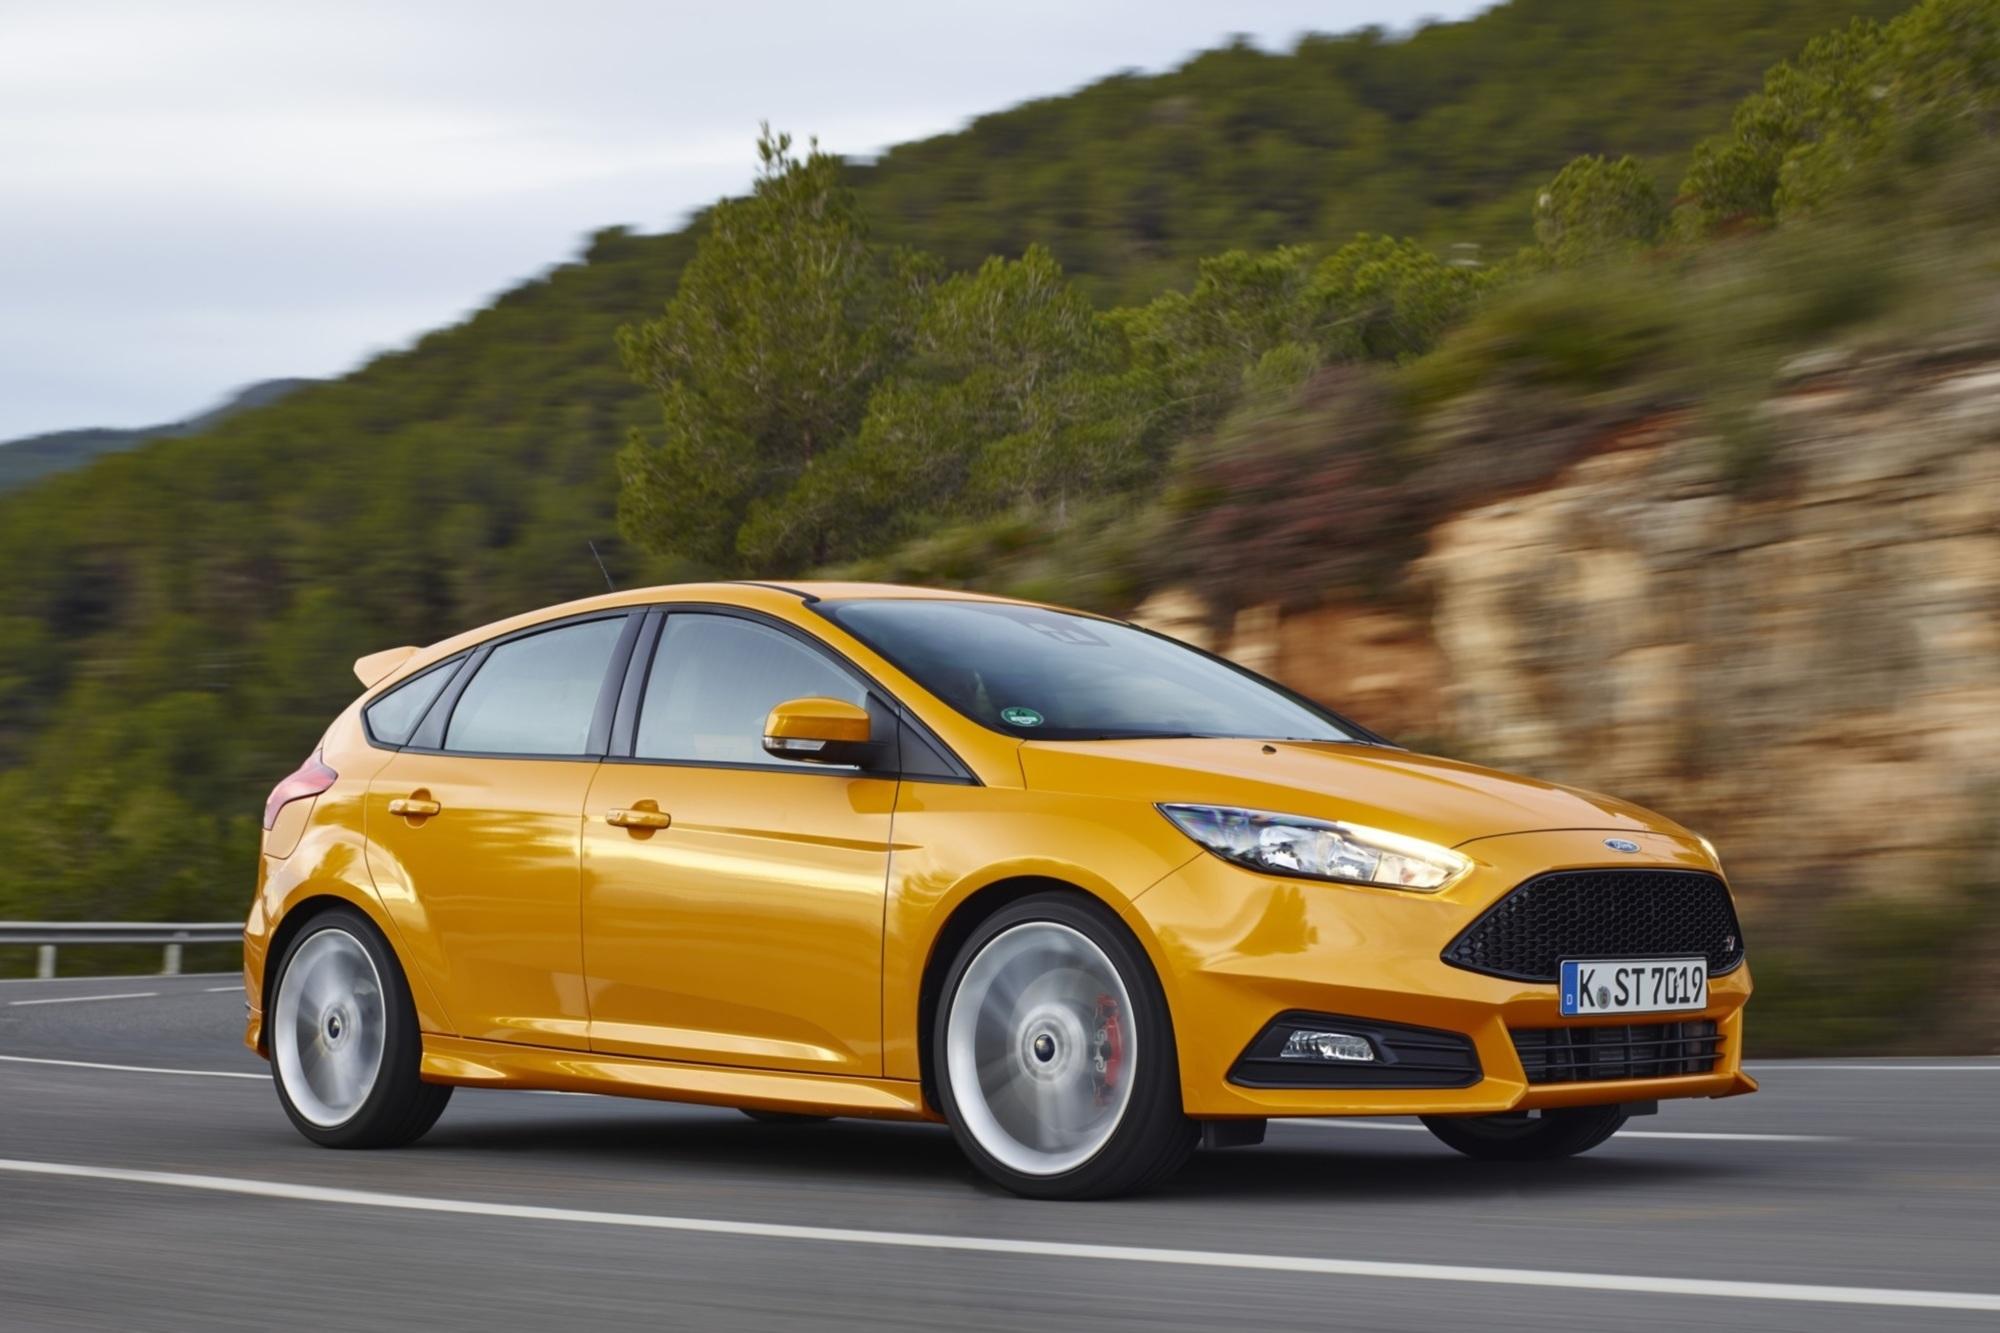 Fahrbericht: Ford Focus ST - Vernünftig sportlich